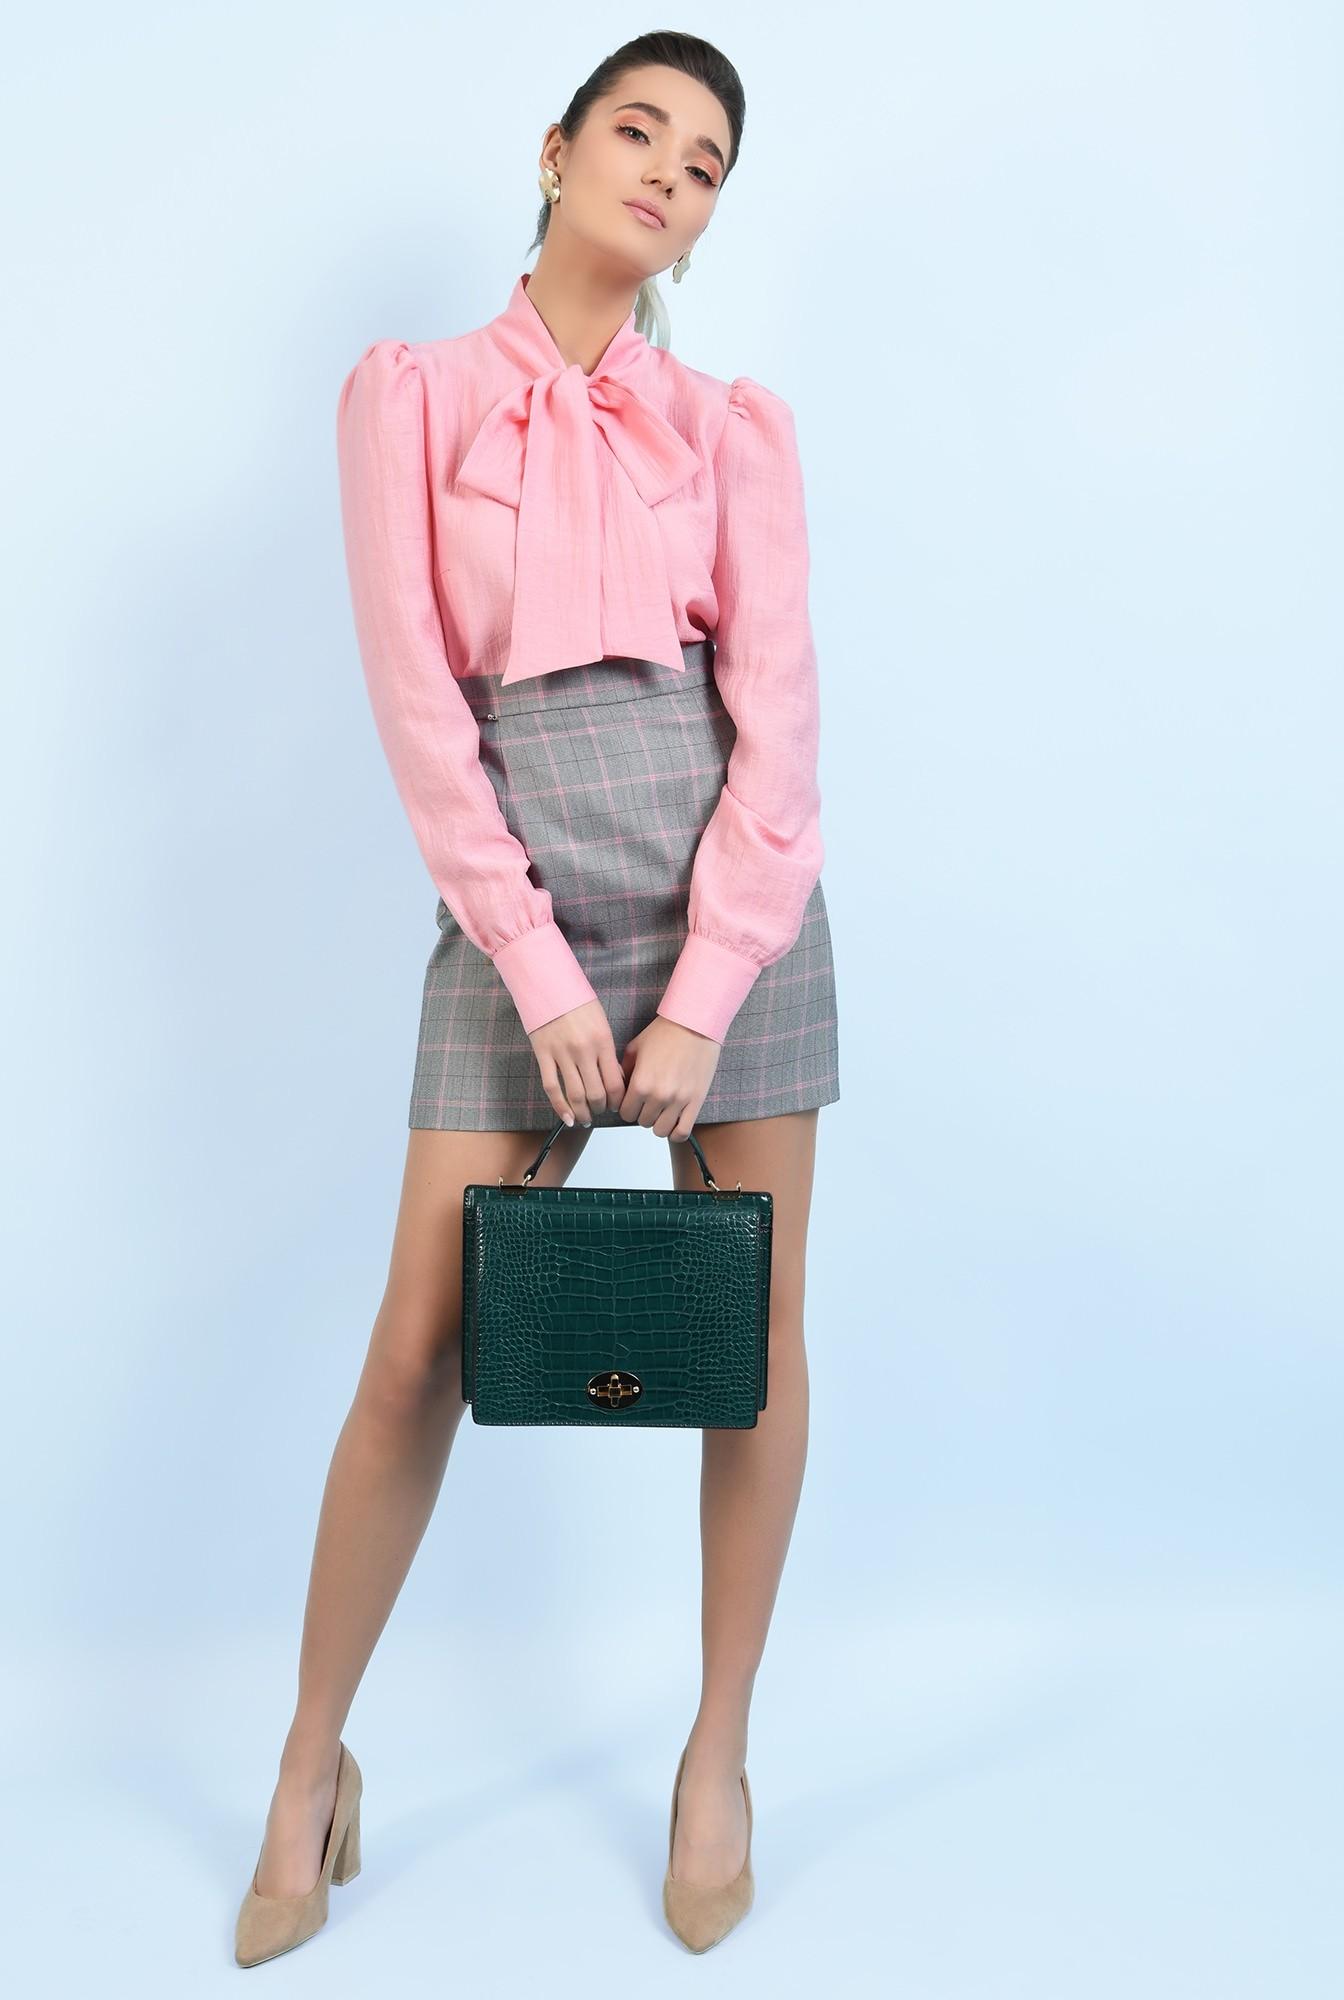 3 - bluza casual, roz, cu funda, maneci lungi, Poema